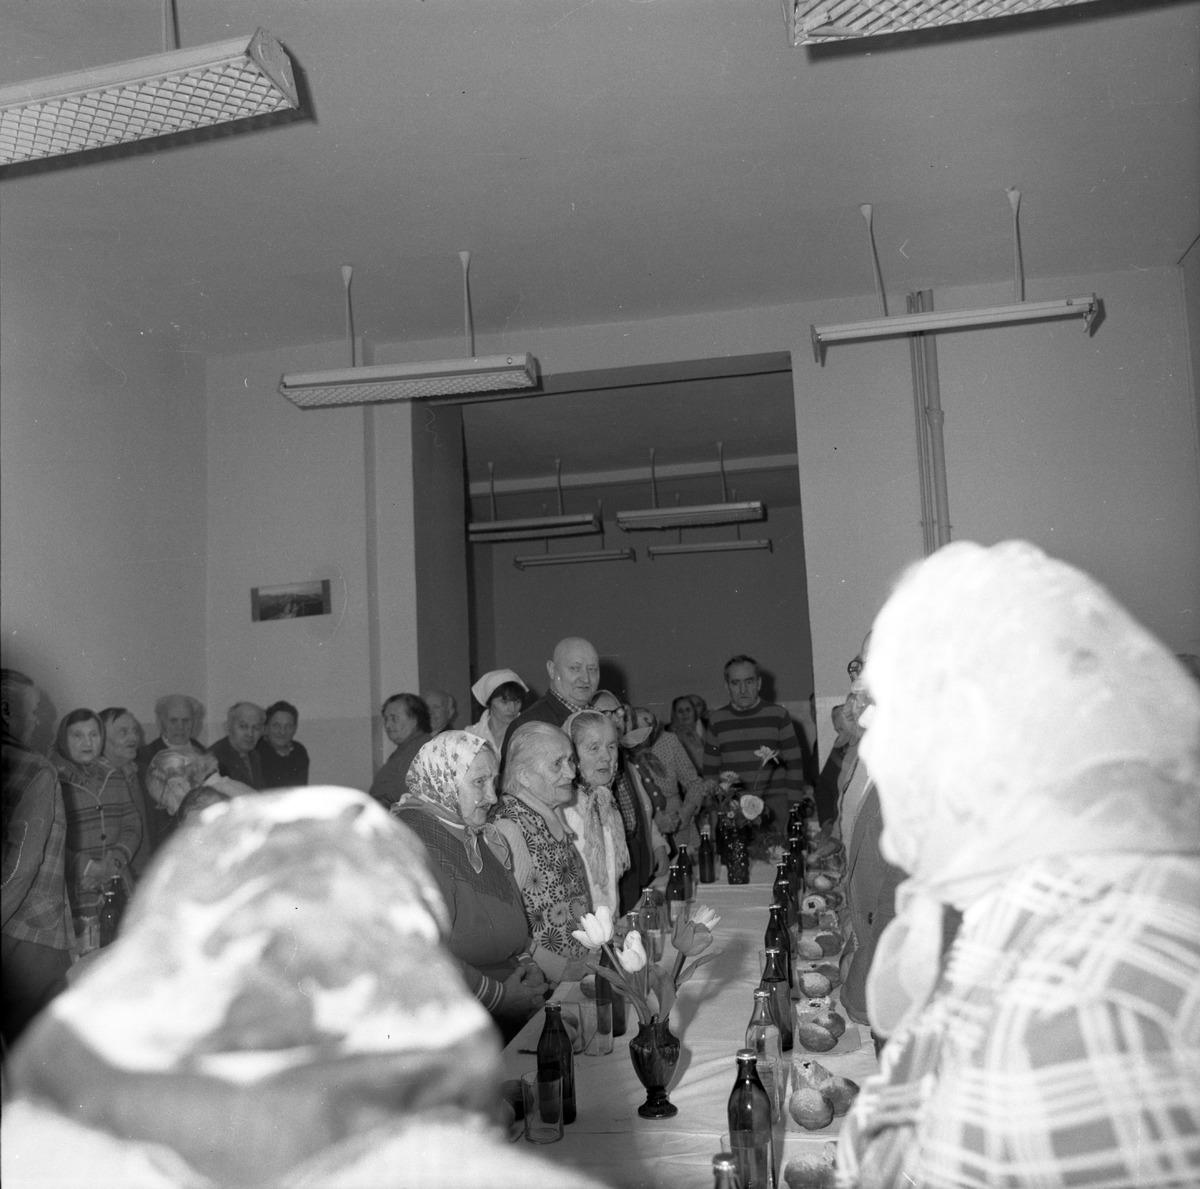 Obchody Dnia Seniora, 1985 r. [4]